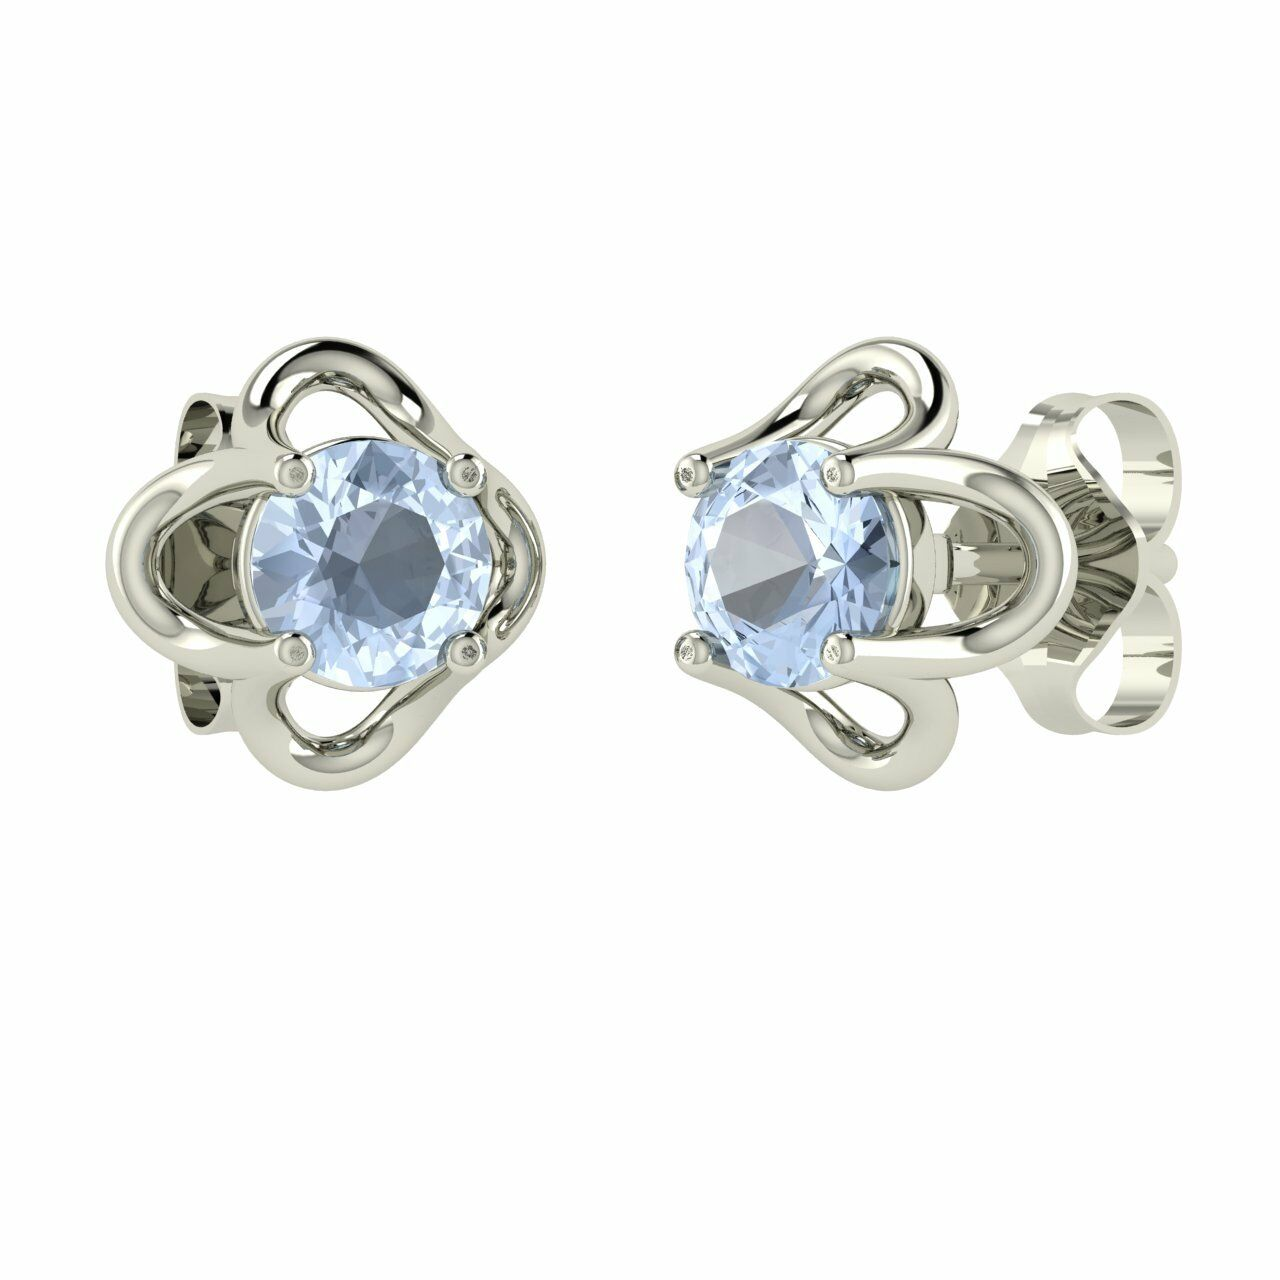 0.37 Carat Natural AAA Aquamarine Stud Earrings in 14k White gold